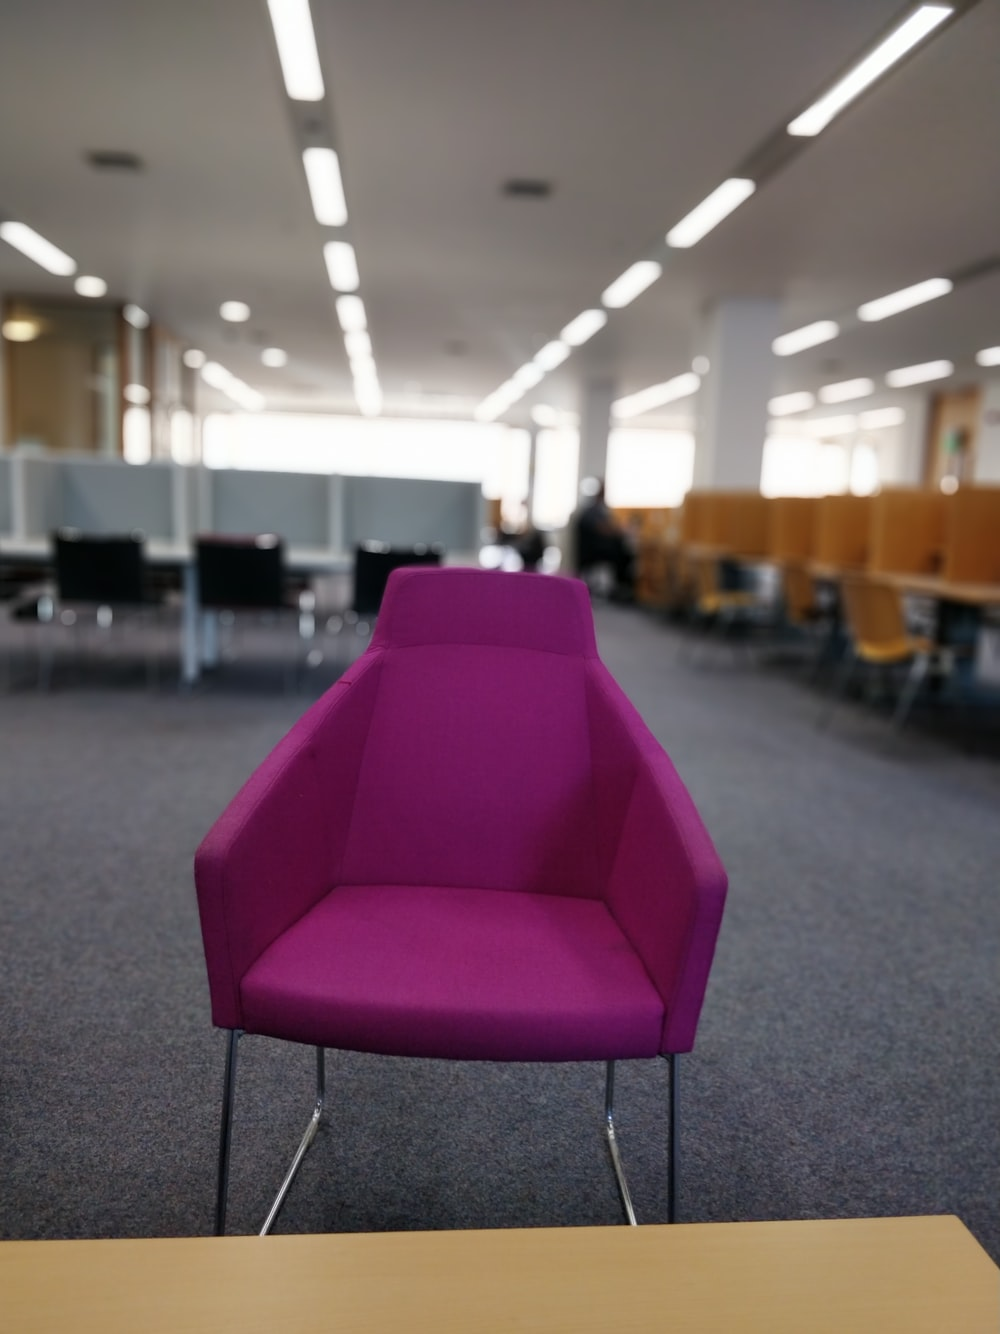 purple chair on gray carpet